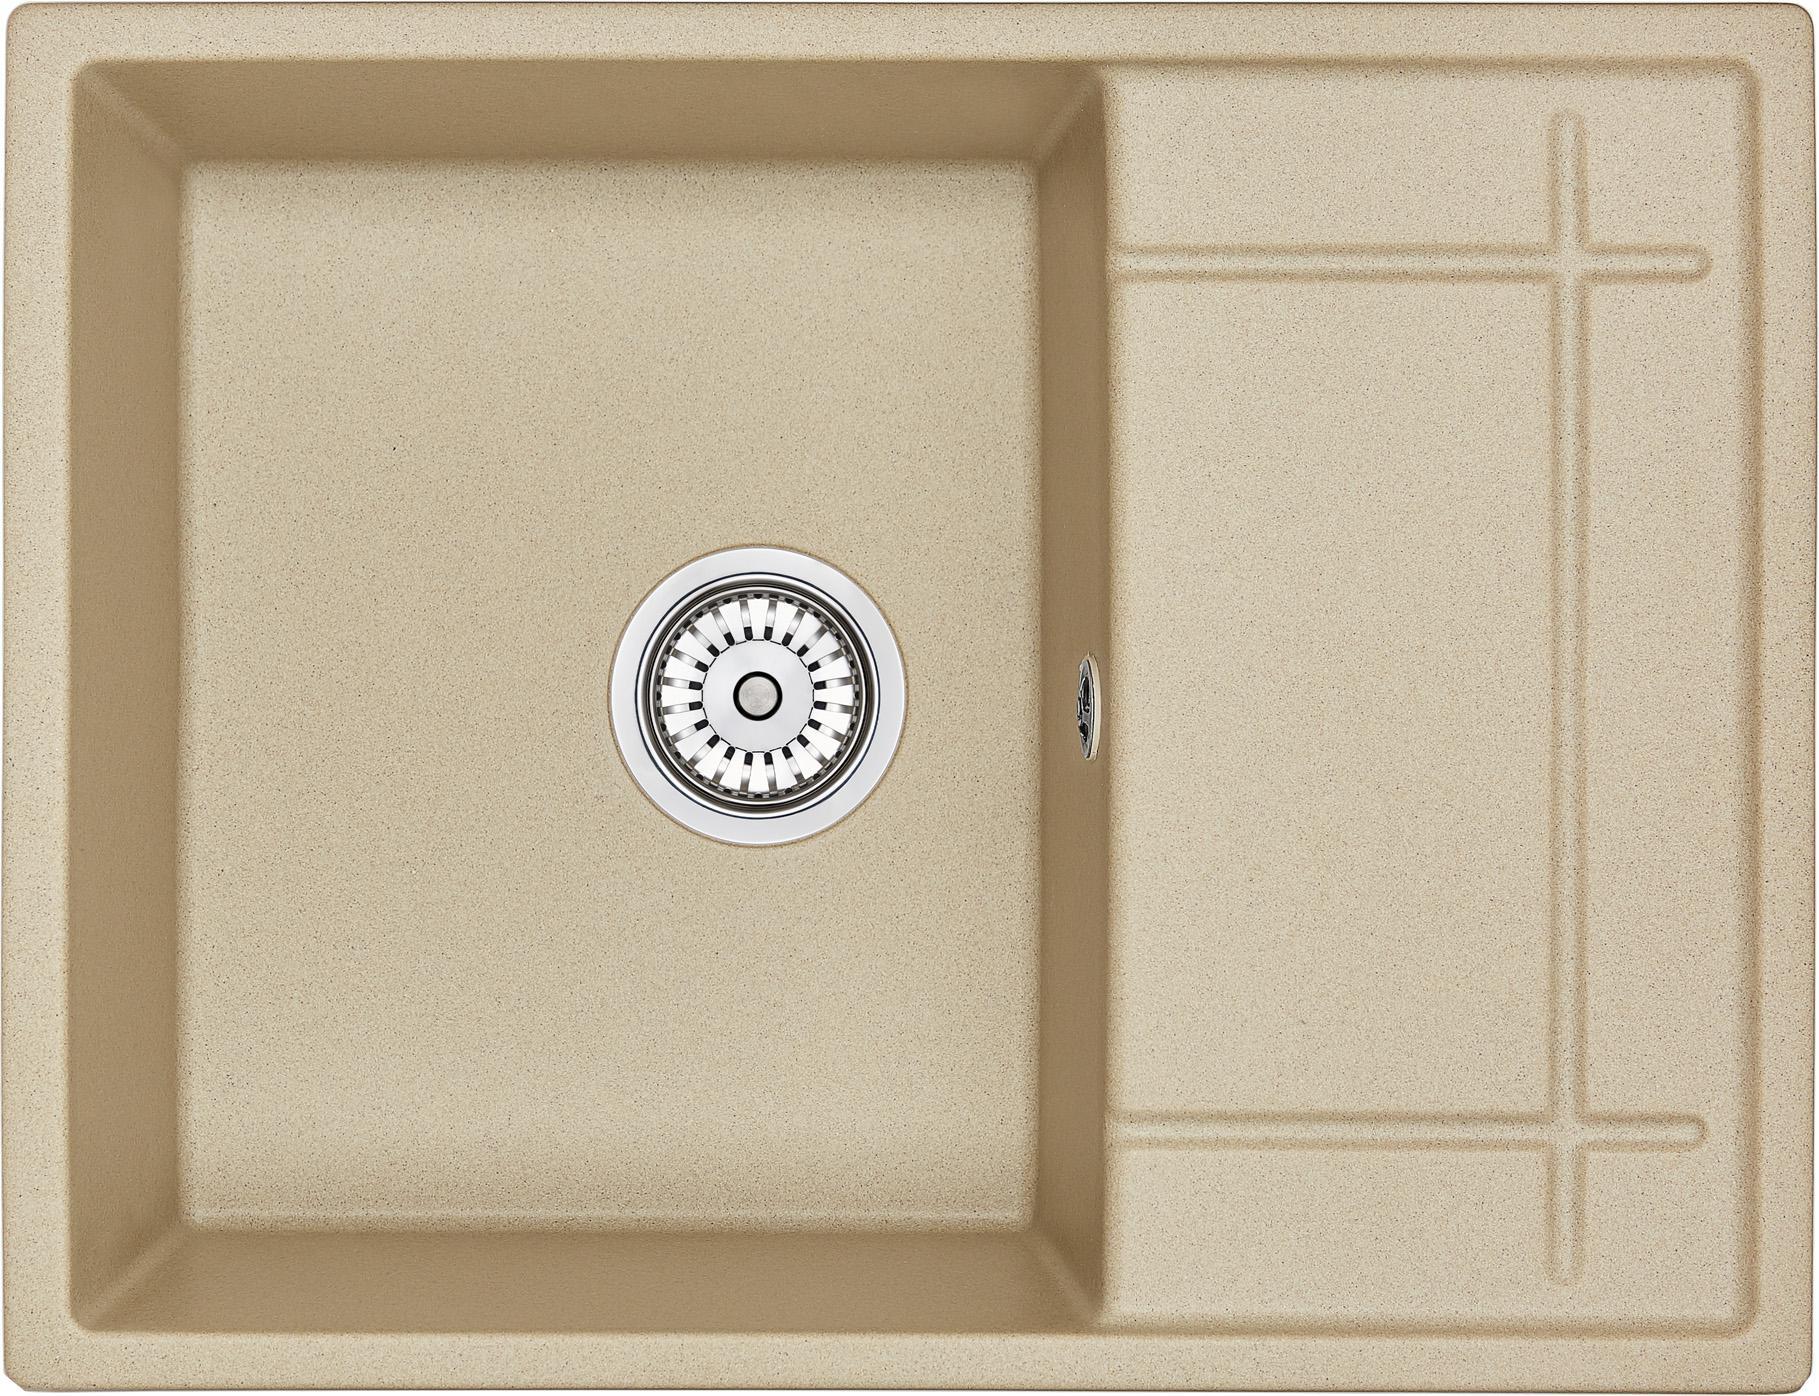 Мойка кухонная Granula Gr-6501 кухонная мойка granula 4201 классик